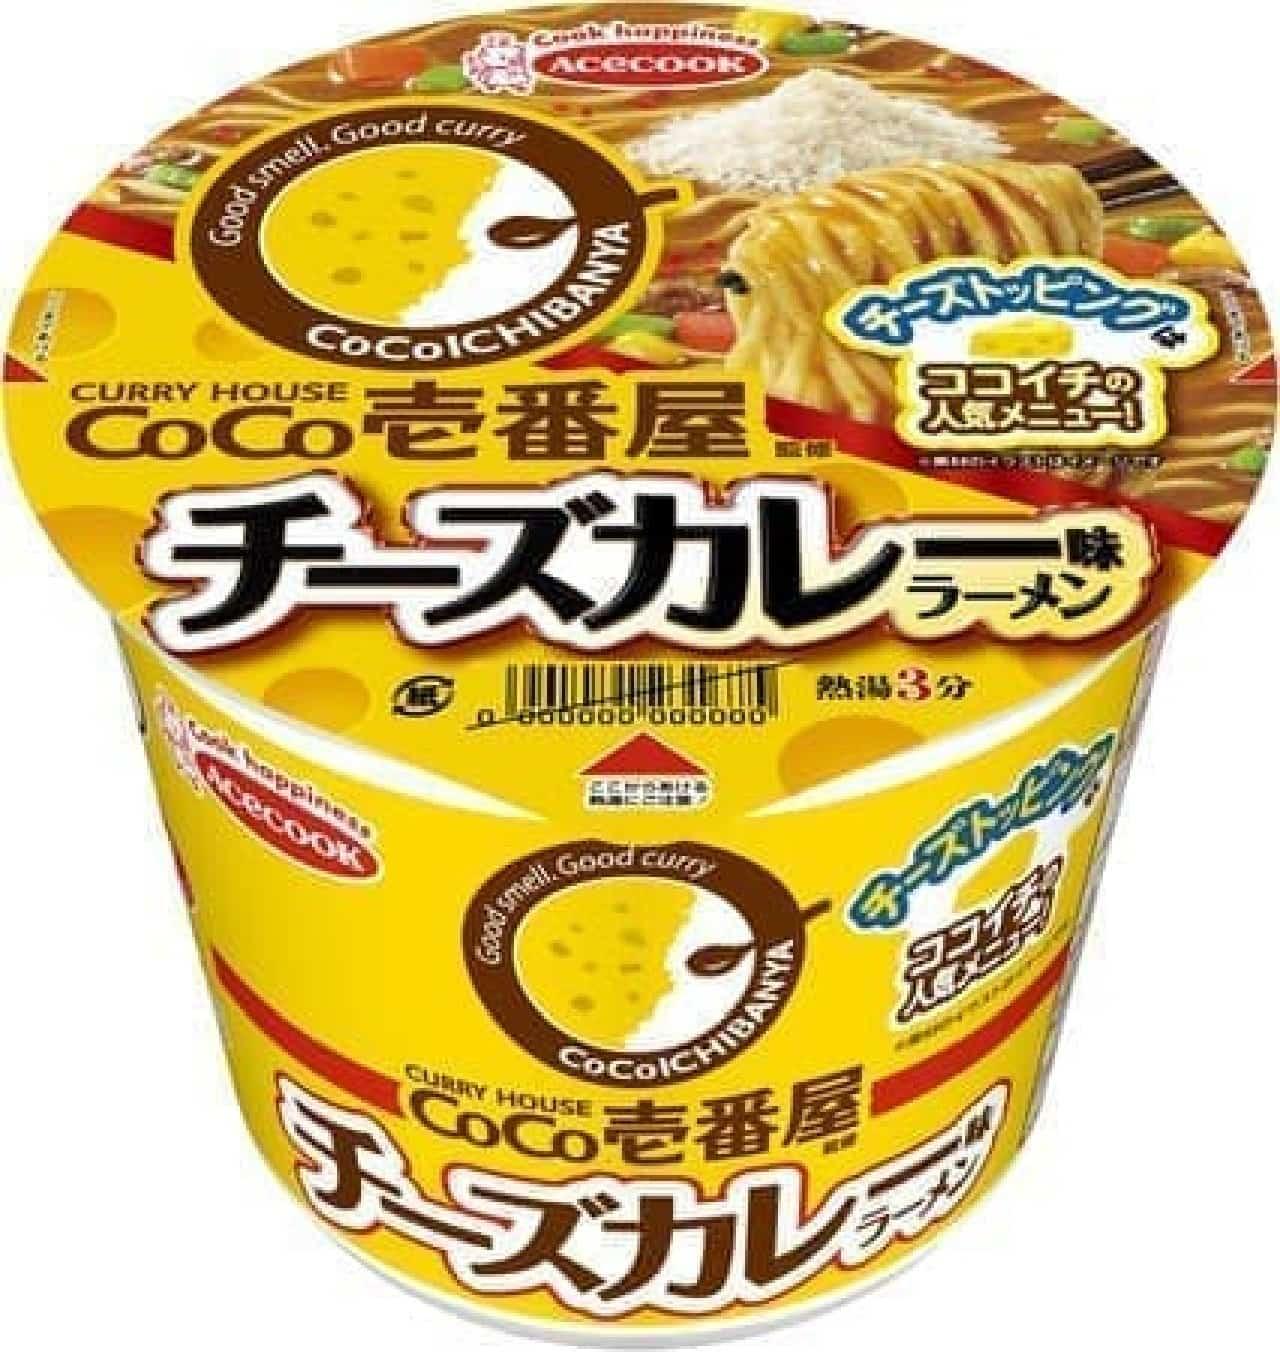 CoCo壱番屋監修 チーズカレー味ラーメン